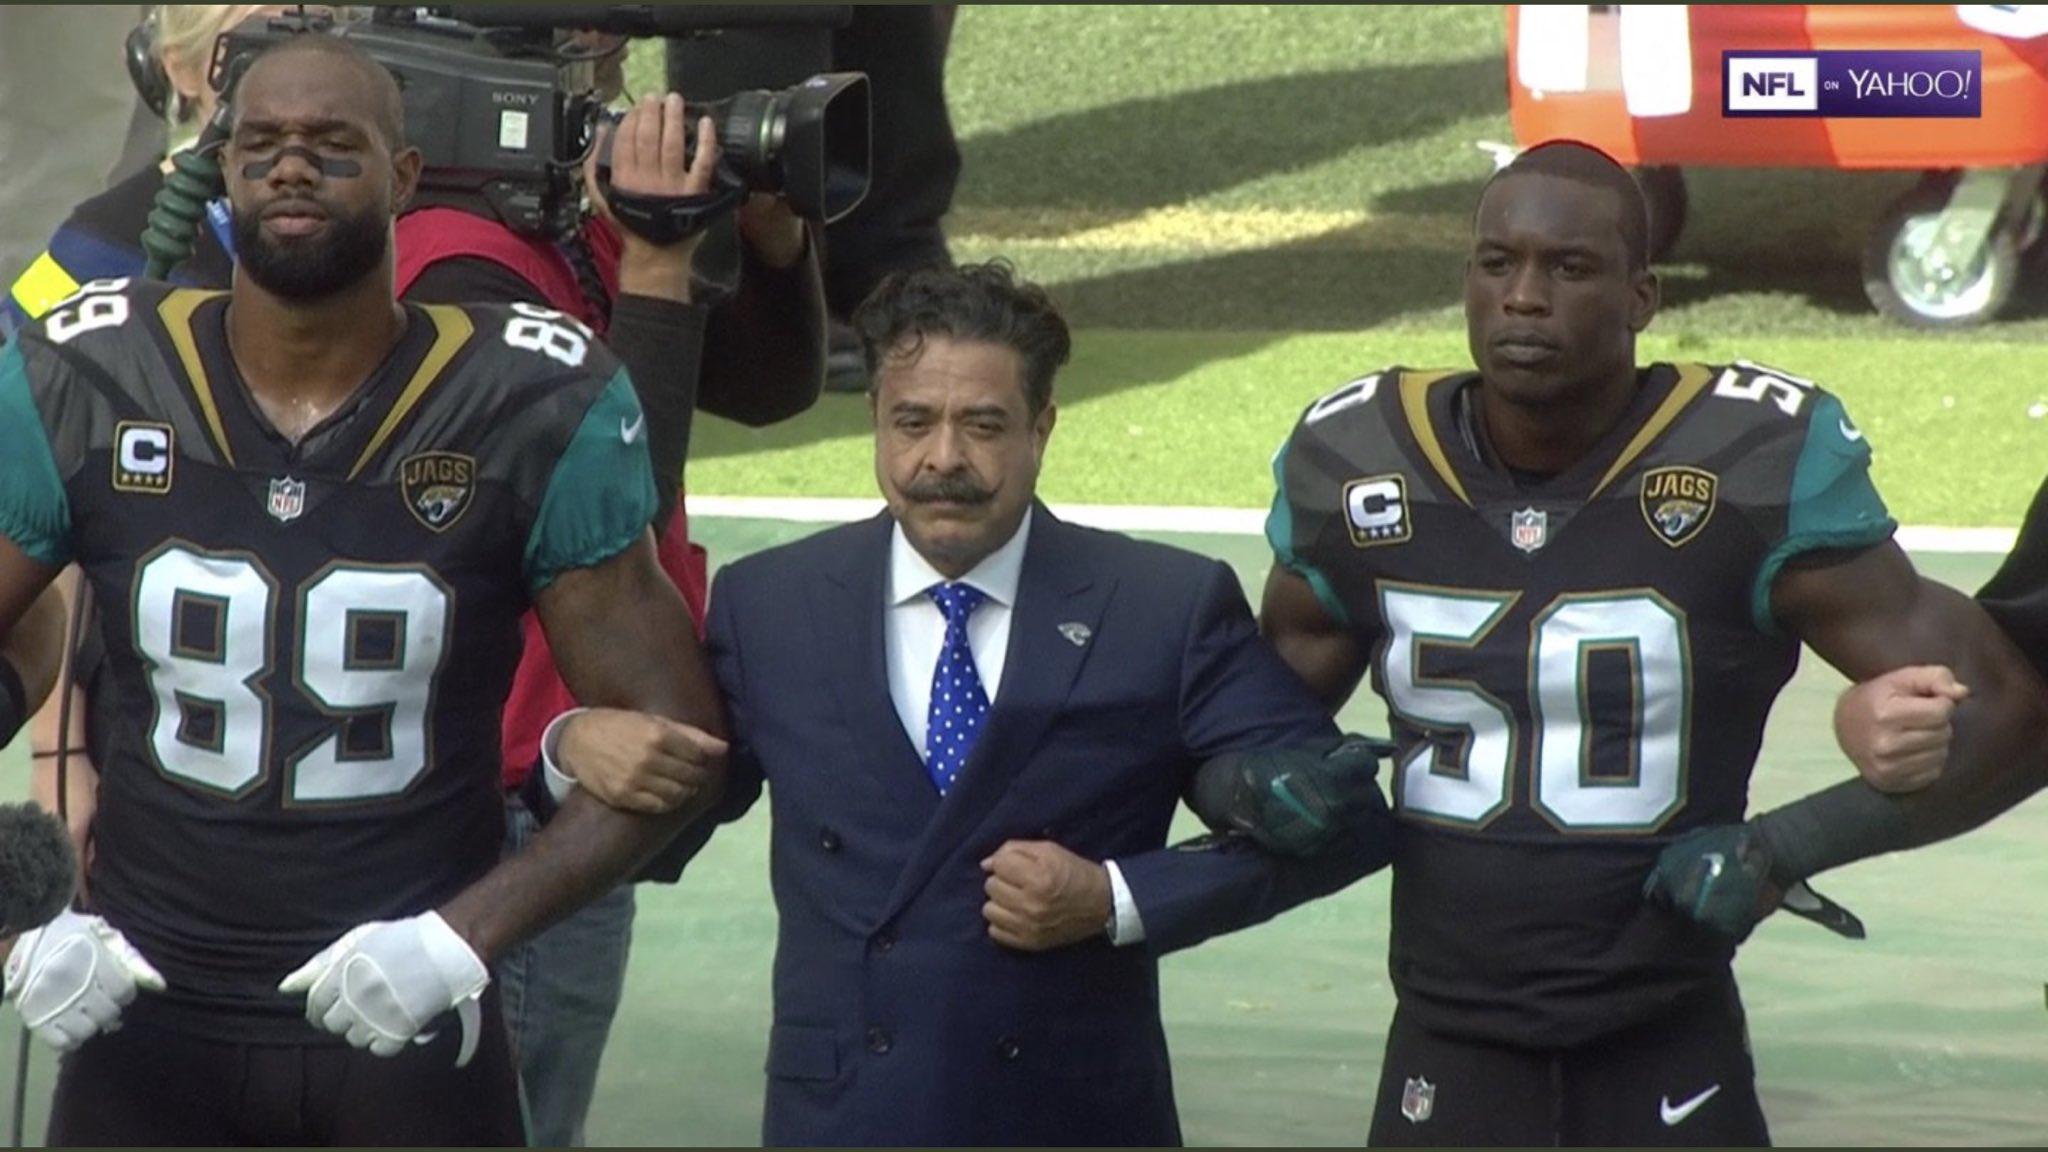 Jaguars' owner Shad Khan: https://t.co/aMO8cHDWYb